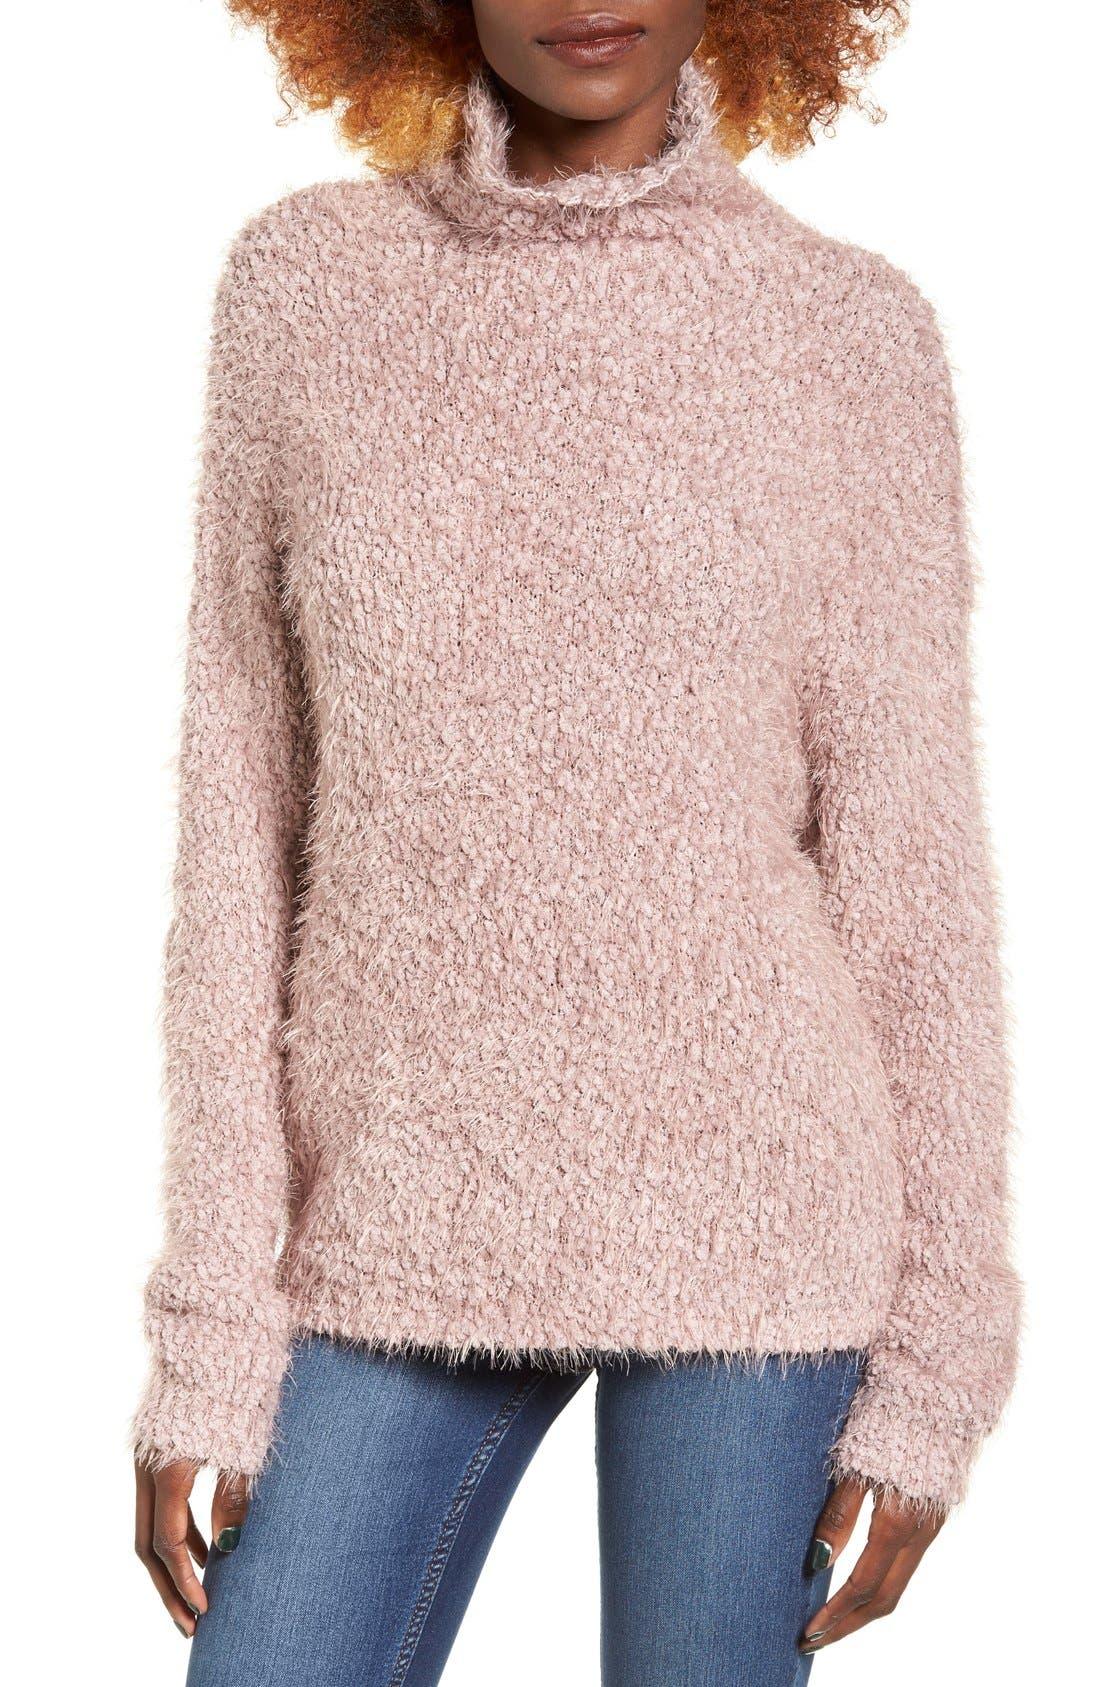 Main Image - BP. Fluffy Knit Mock Neck Pullover